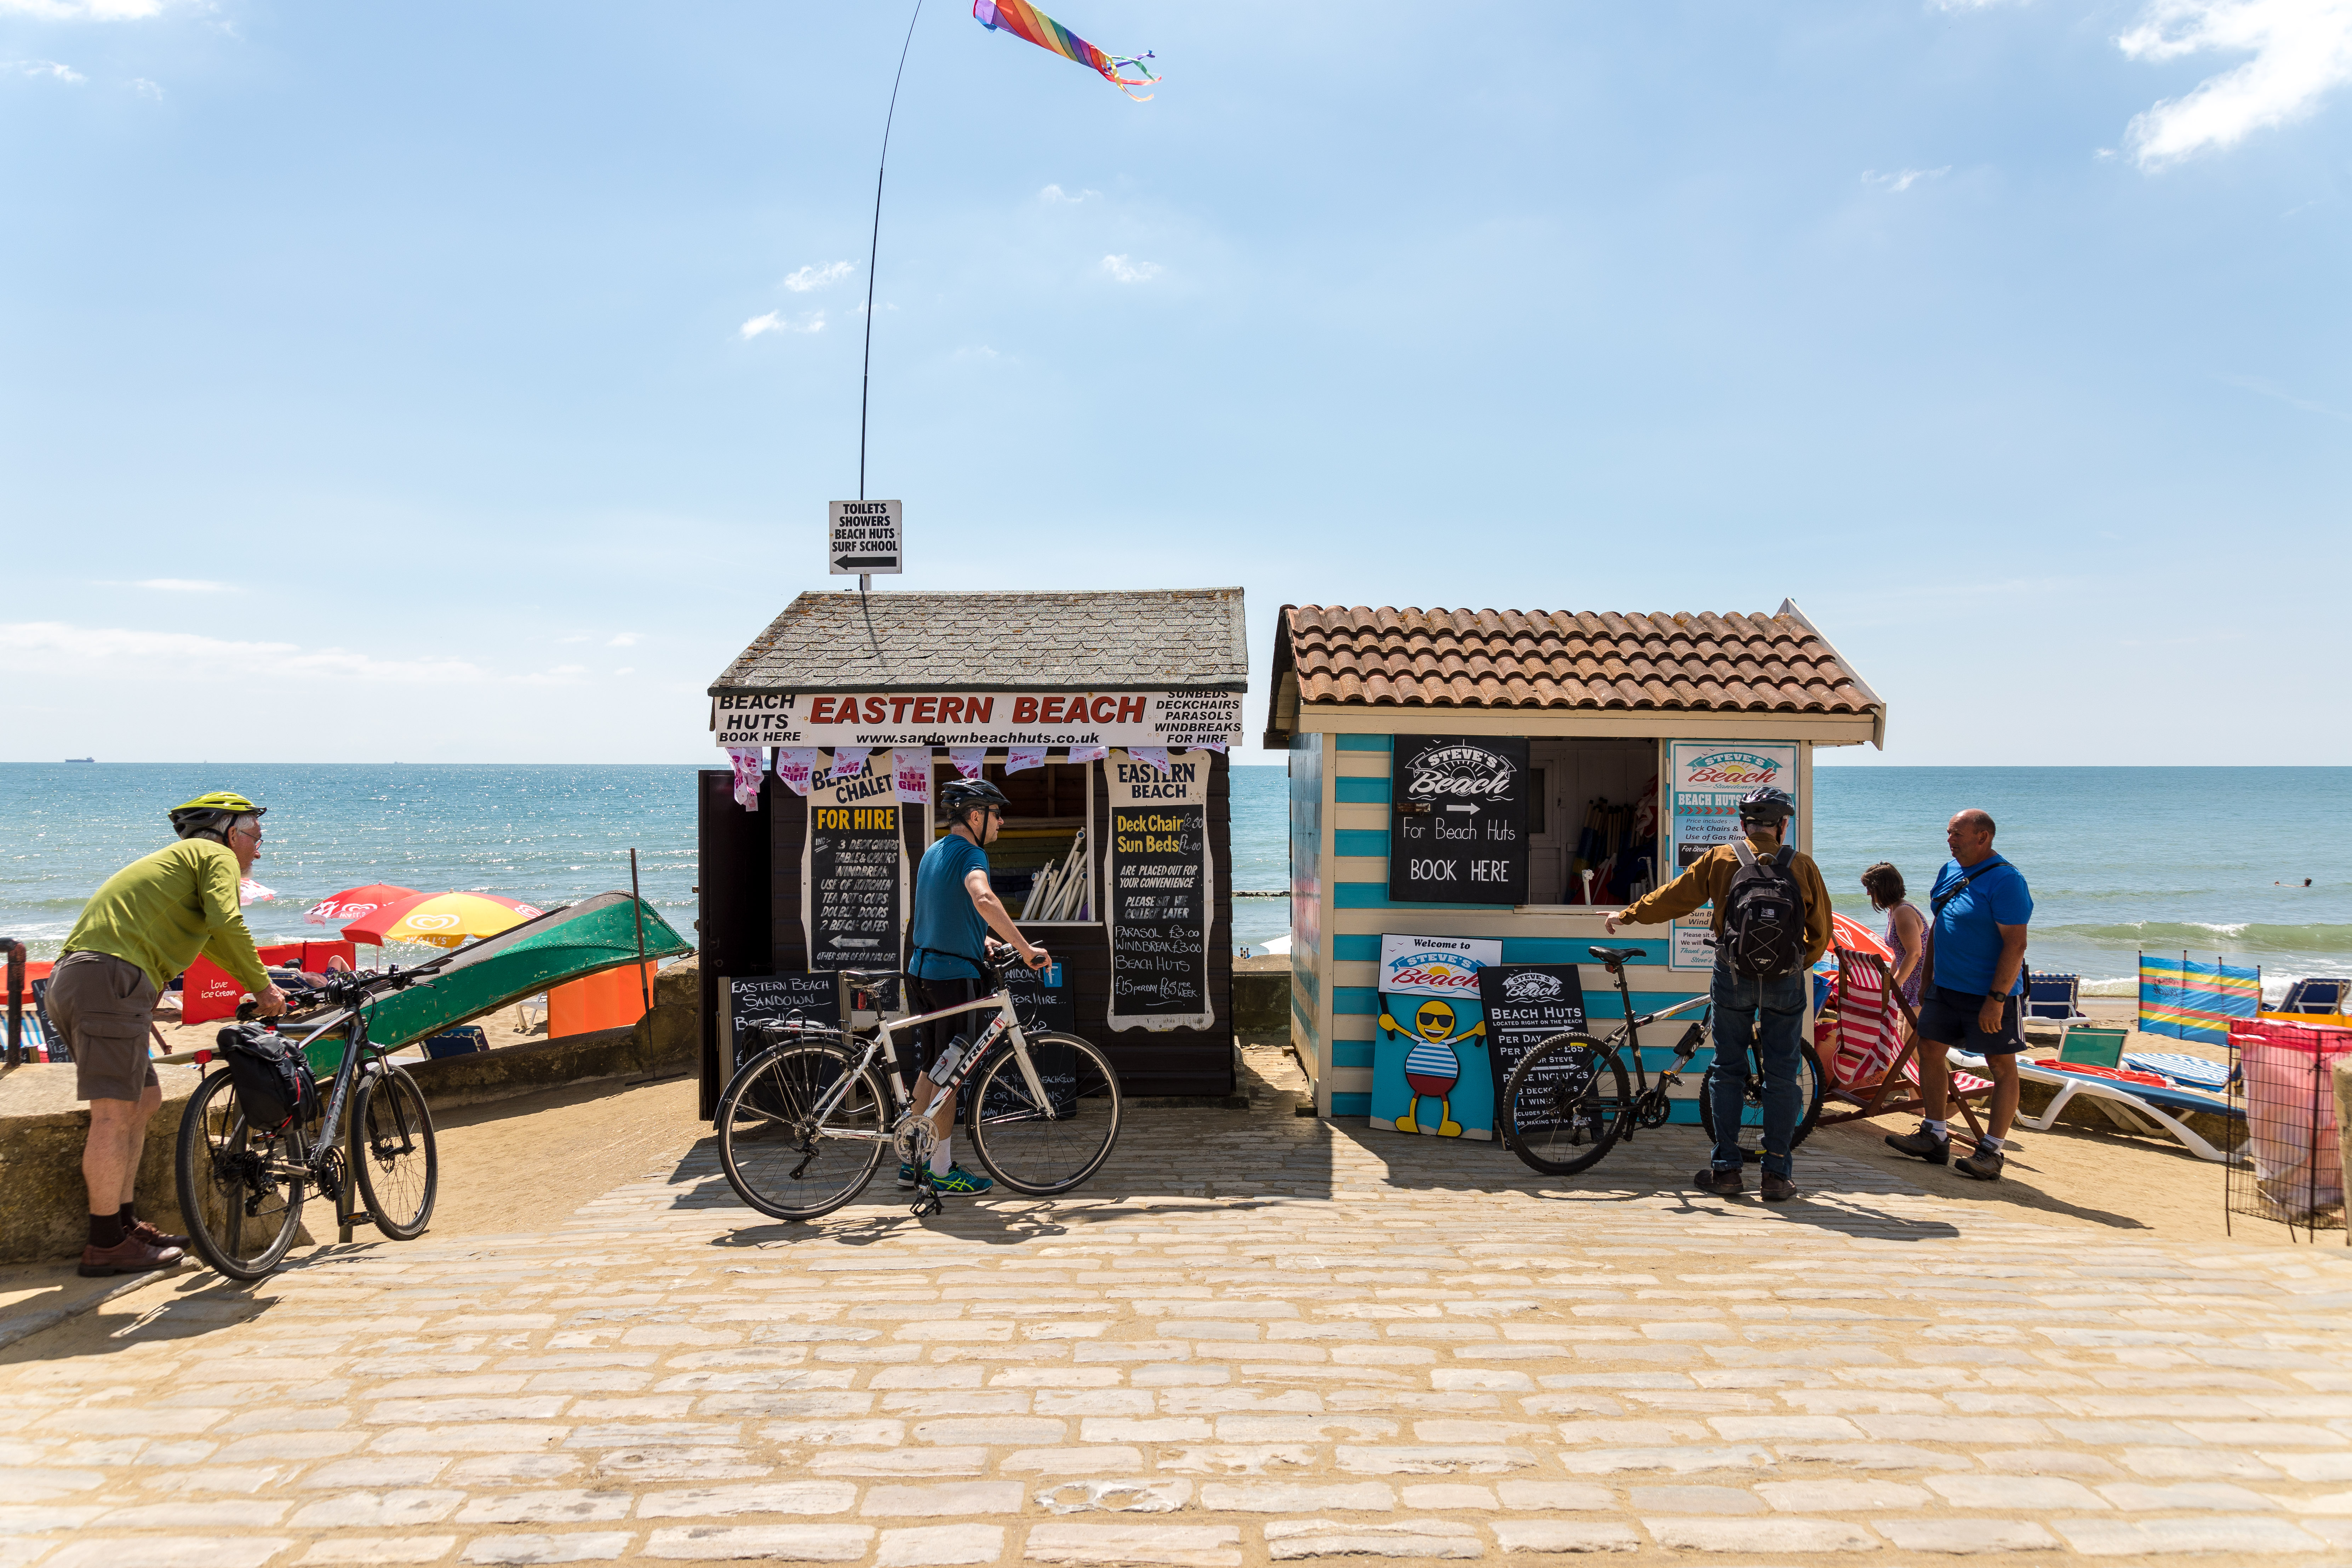 Isle of Wight beach awards